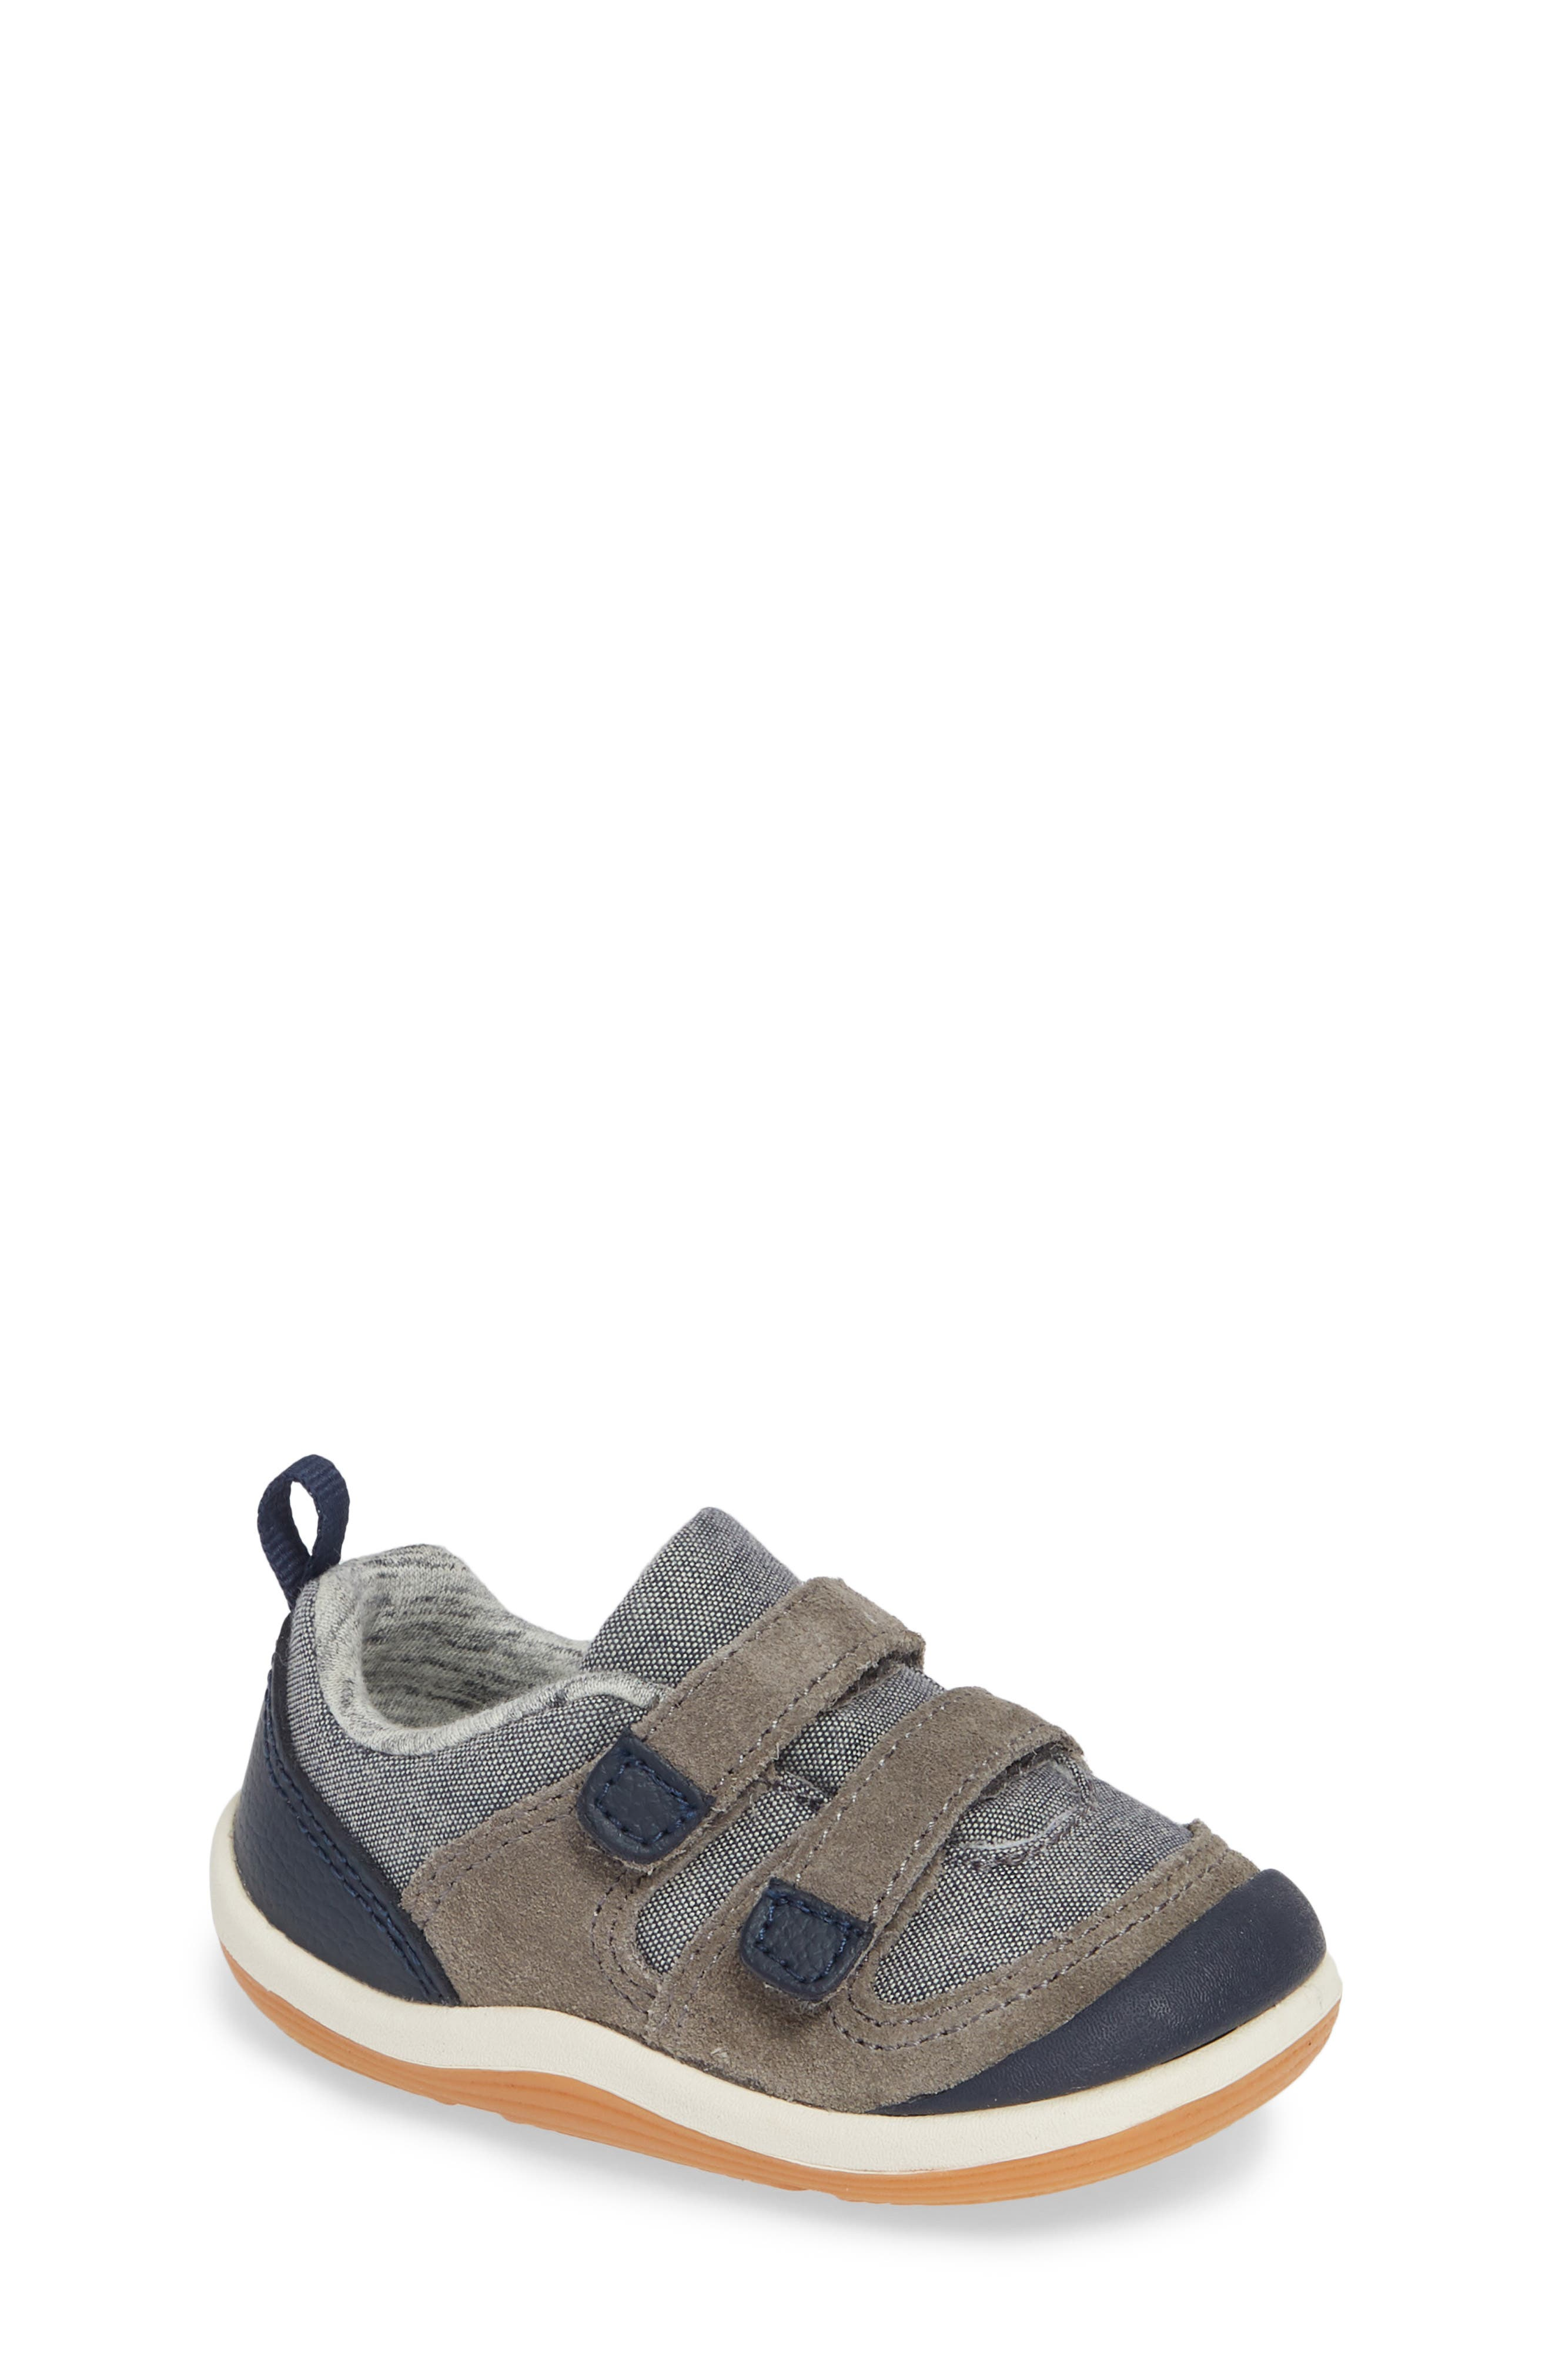 Kieran Sneaker,                         Main,                         color, 410